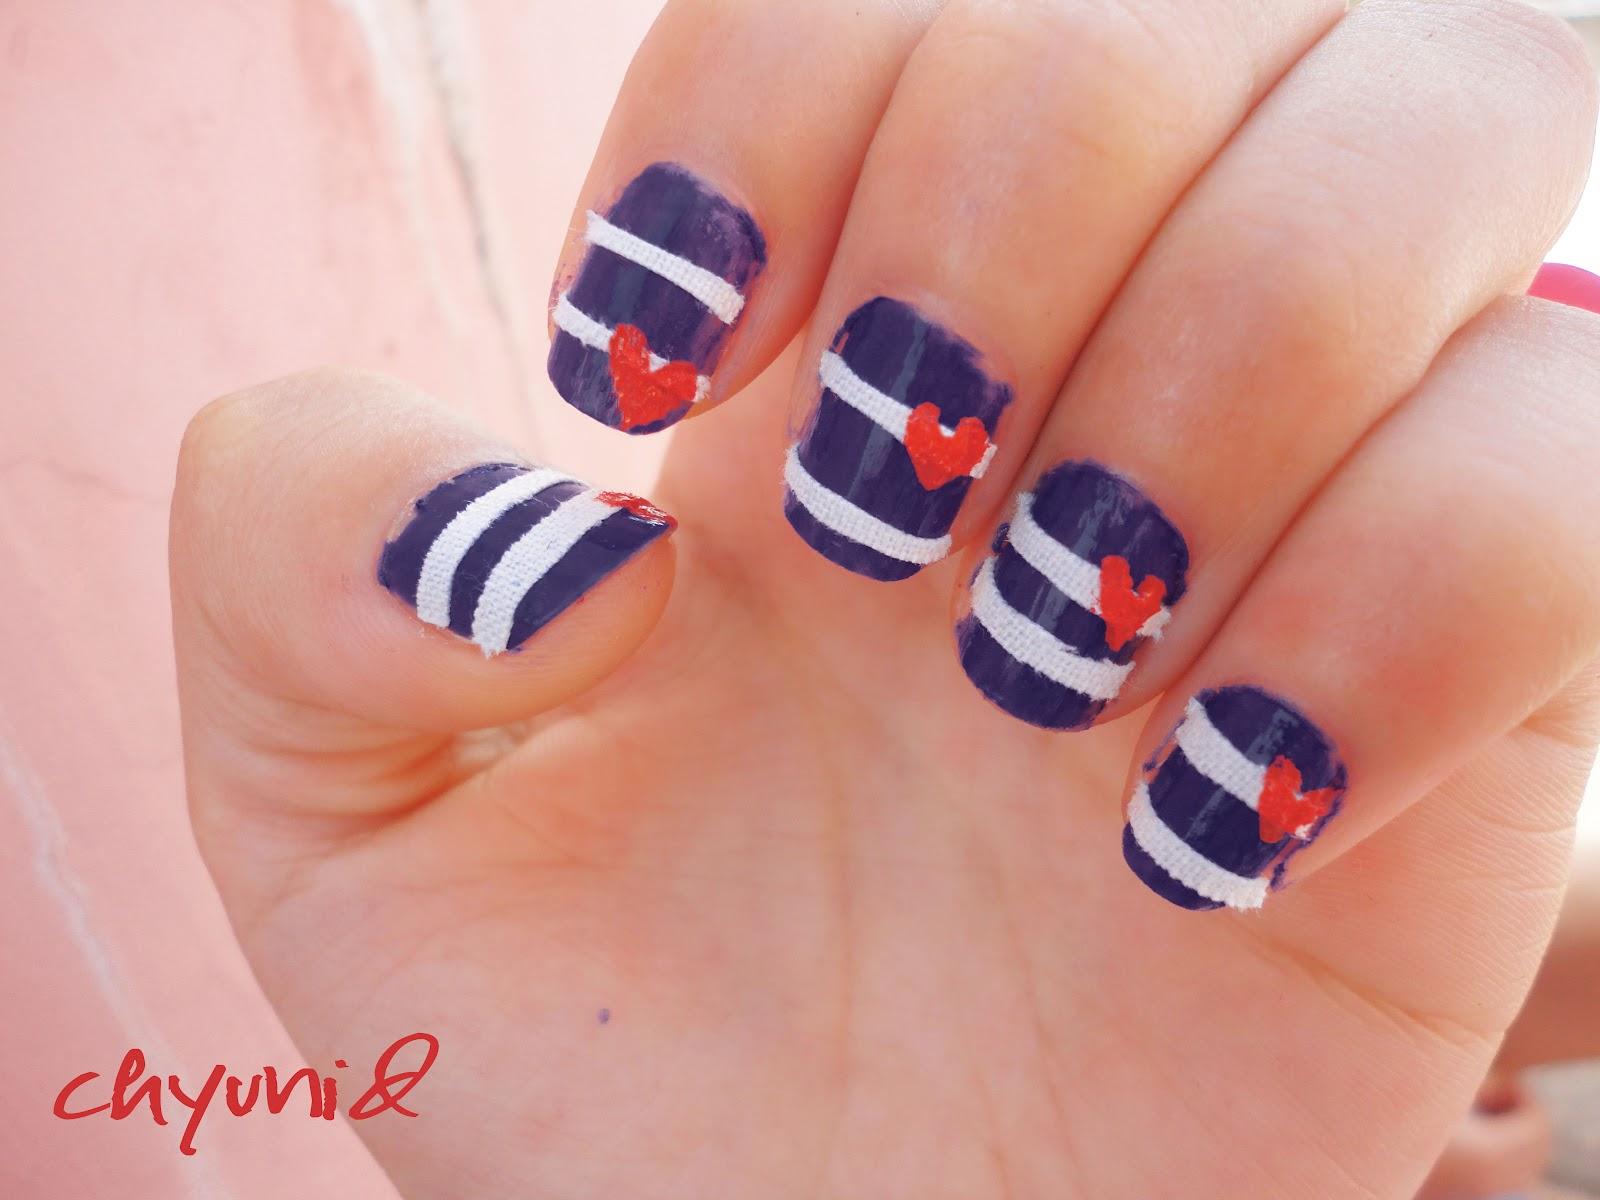 Famoso Heart Nail Design Images ~ Heart nail designs pccala IC79